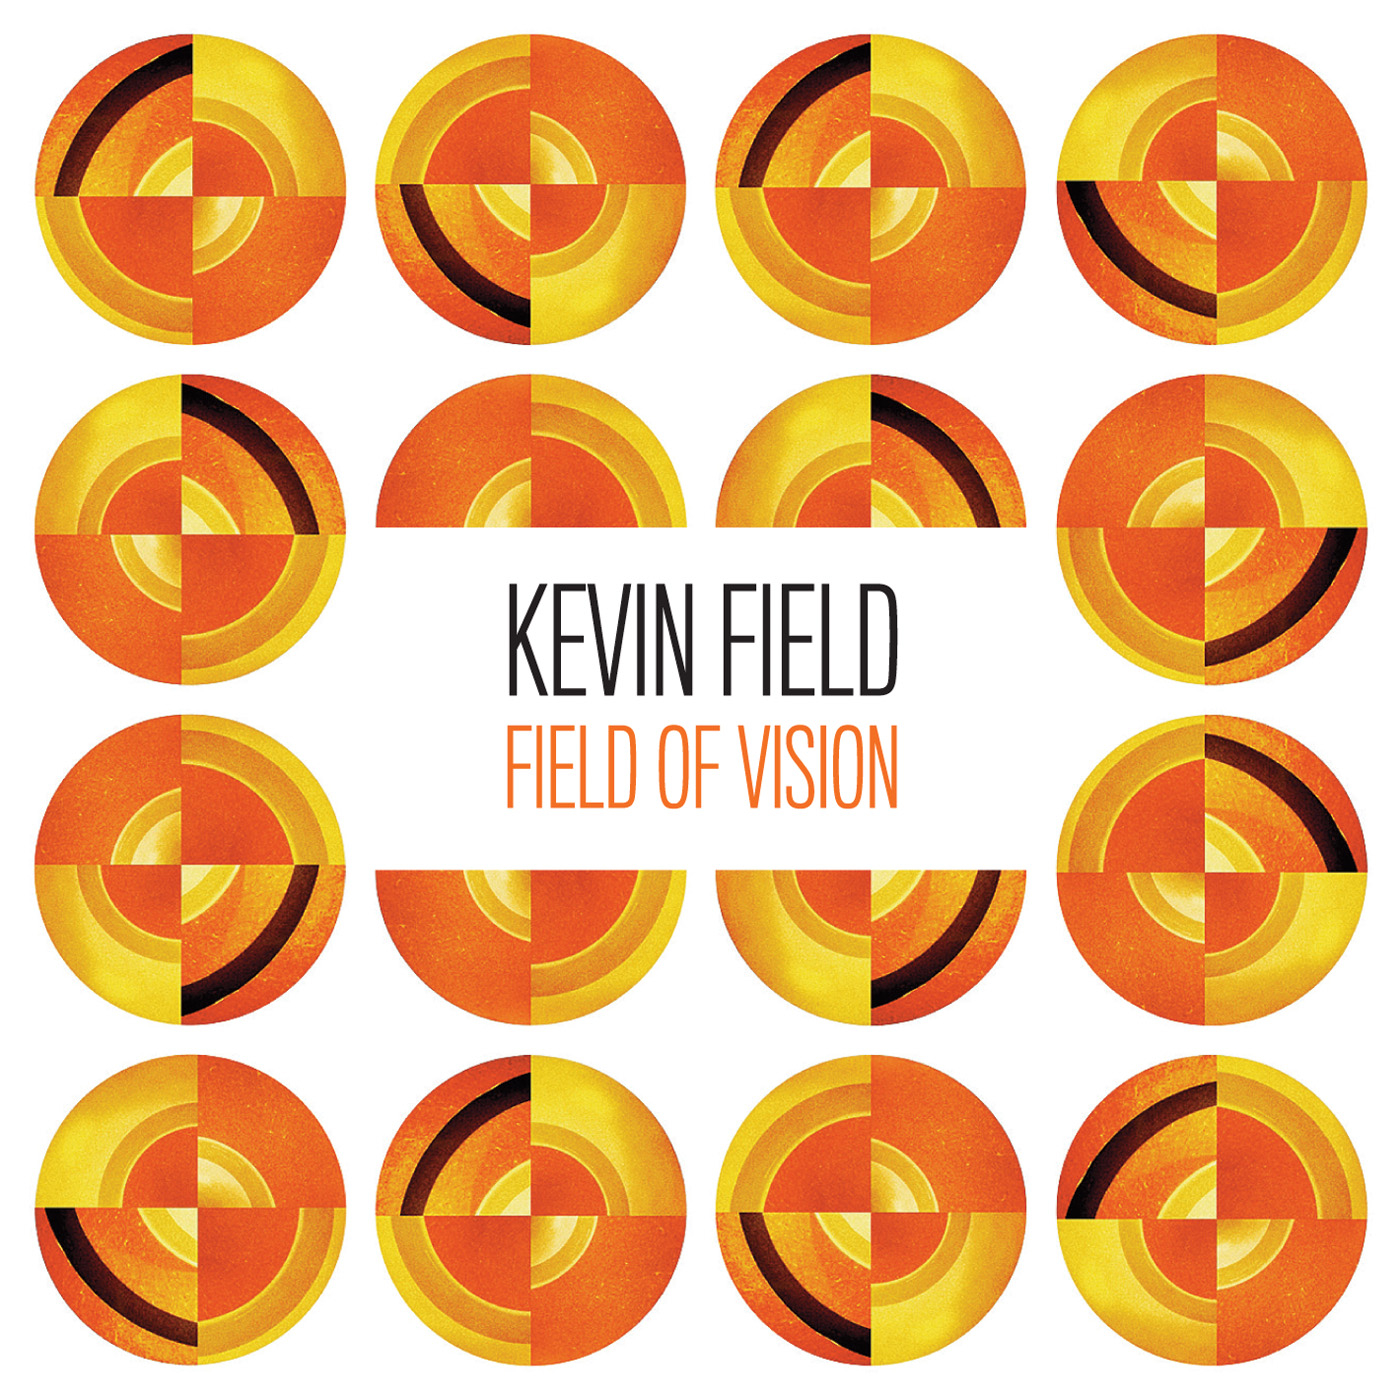 Kevin Field Field Of Vision.jpg